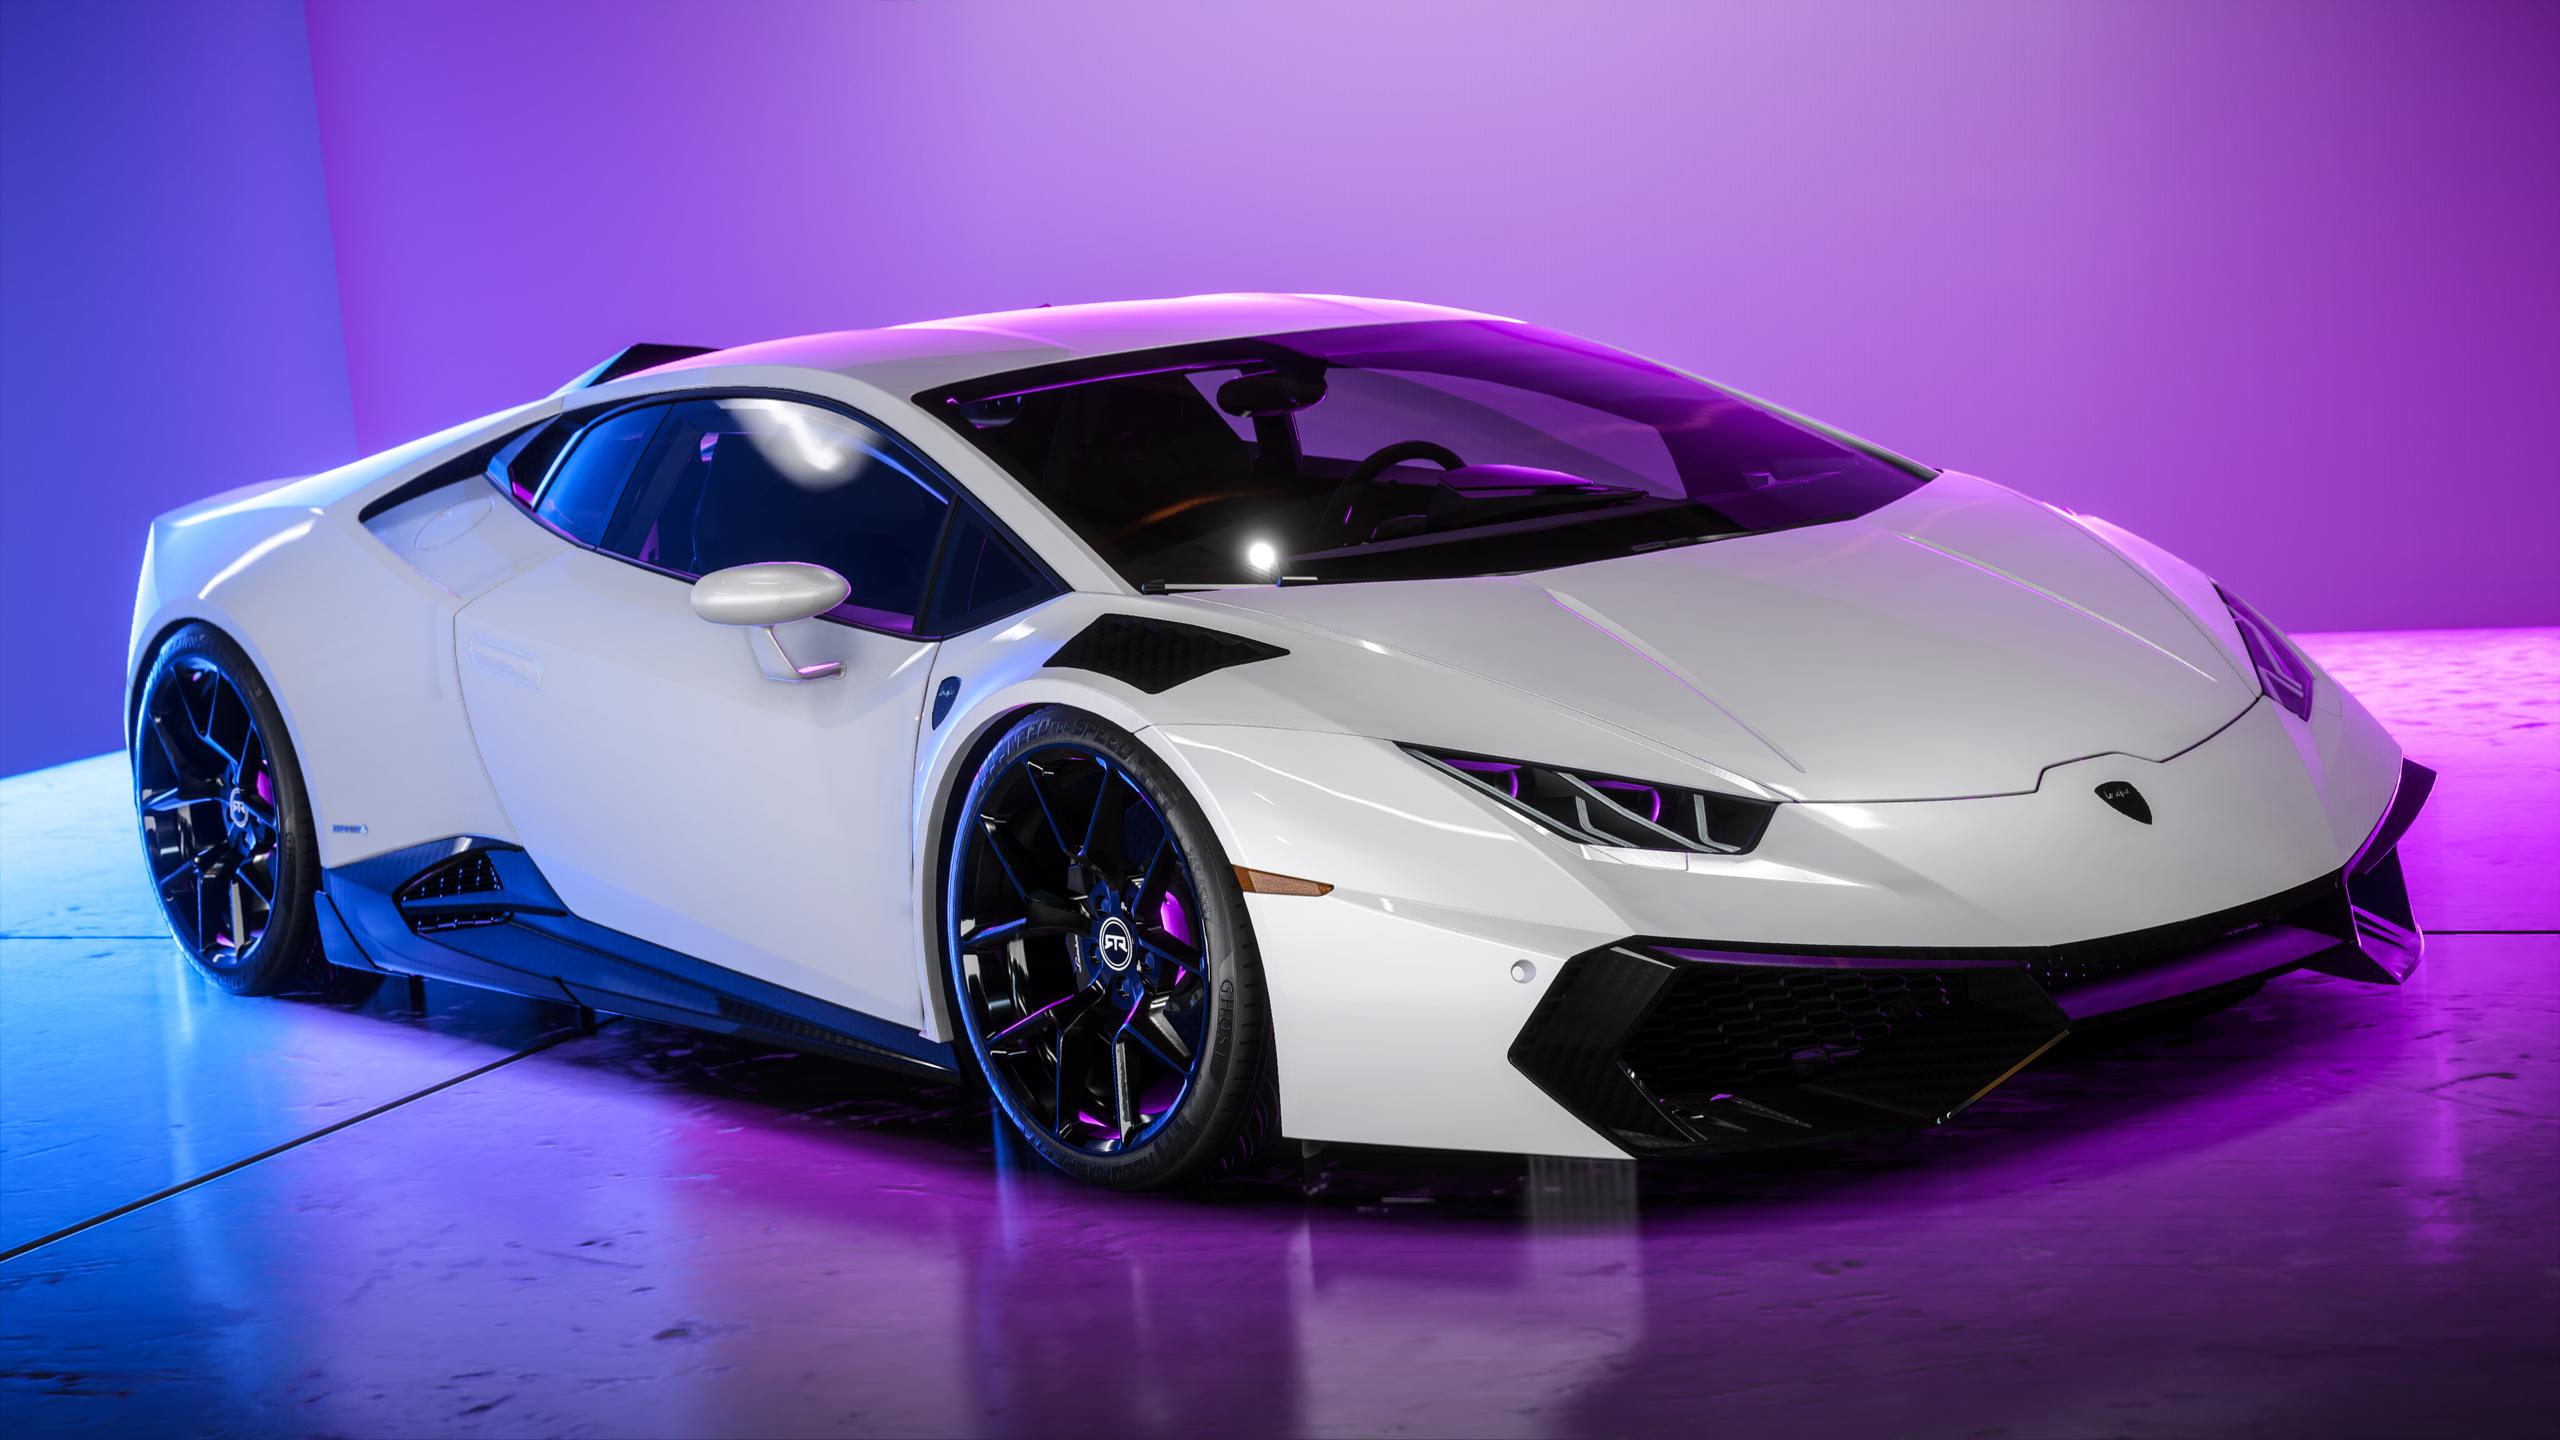 Hd Nfs Cars Wallpapers Neon Lamborghini Wallpaper Hd Car Wallpapers Id 13742